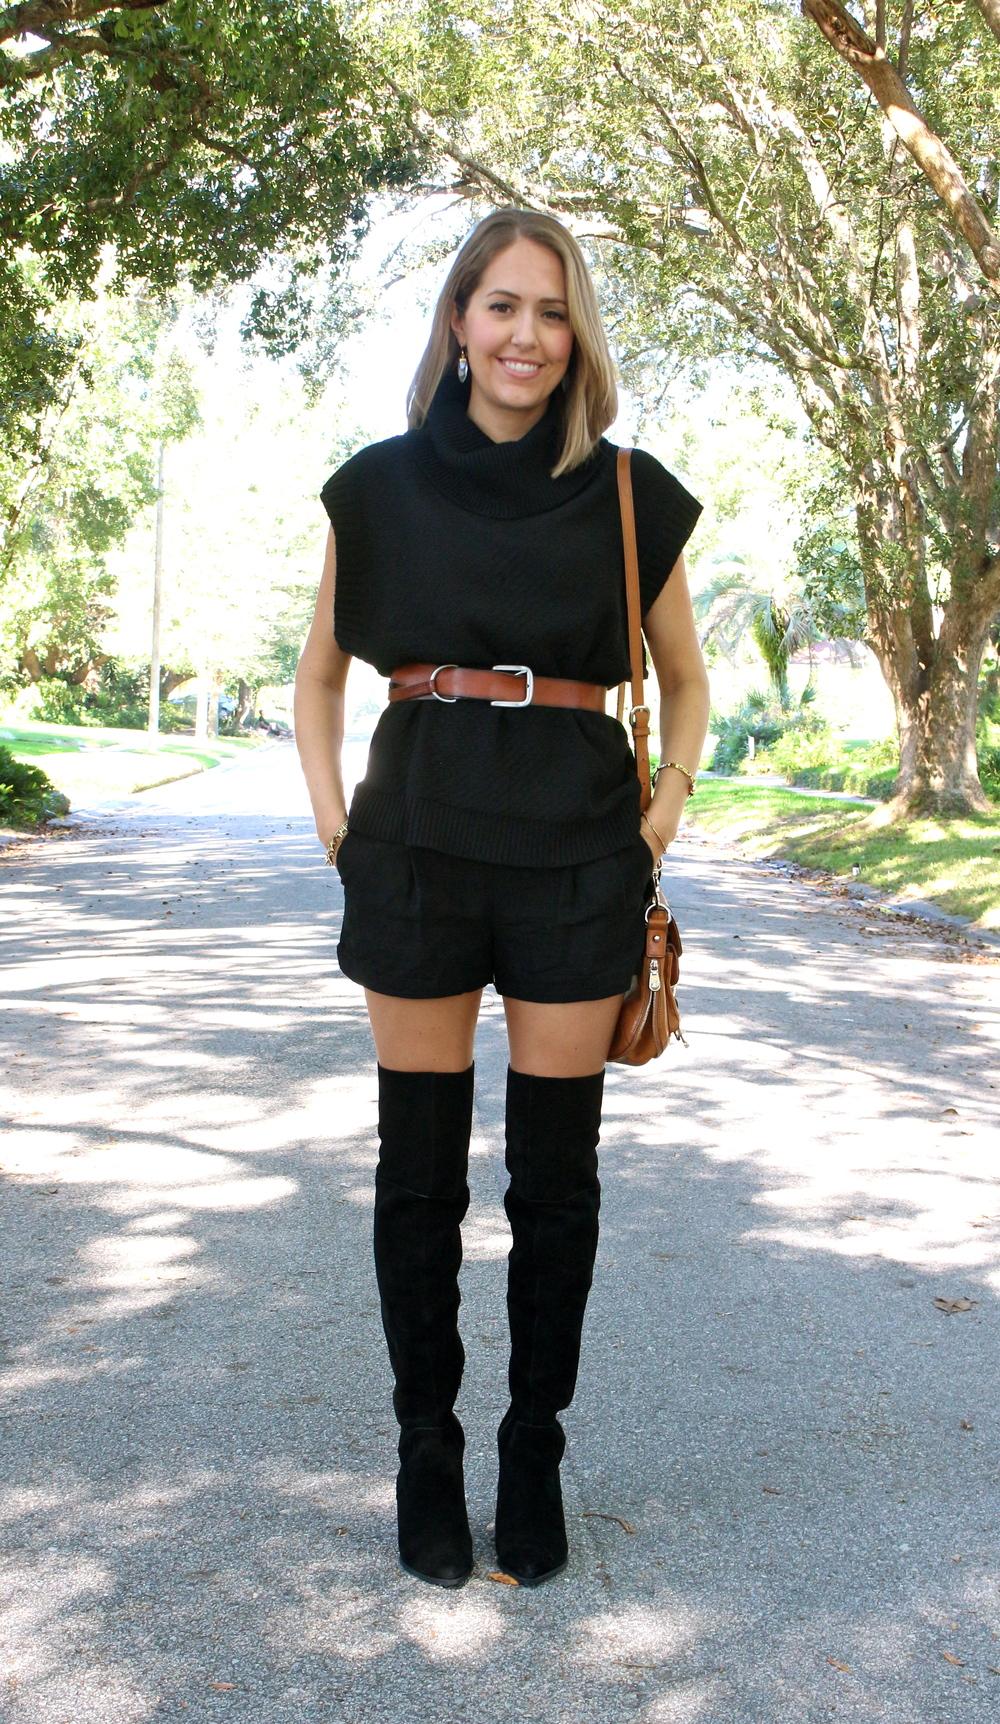 Black turtleneck, black shorts, black boots